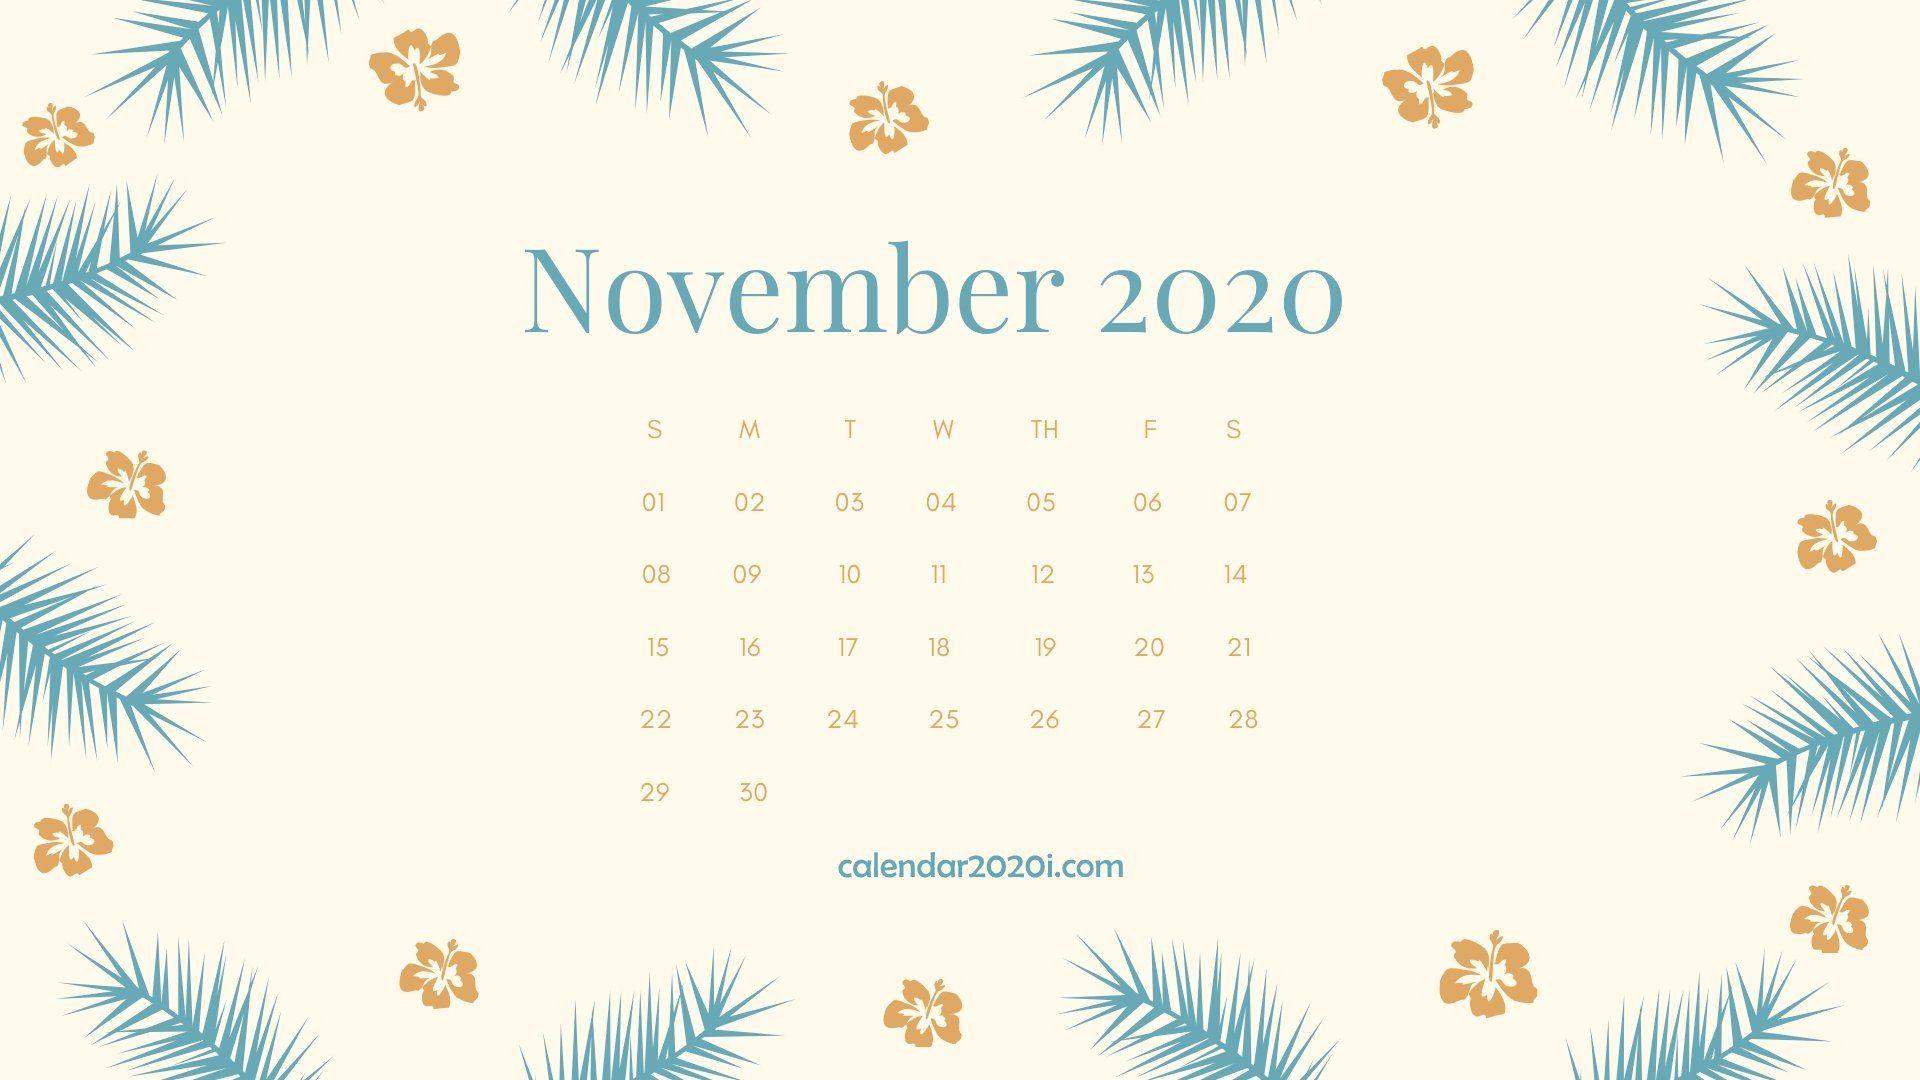 November 2020 Calendar Wallpapers   Top November 2020 1920x1080